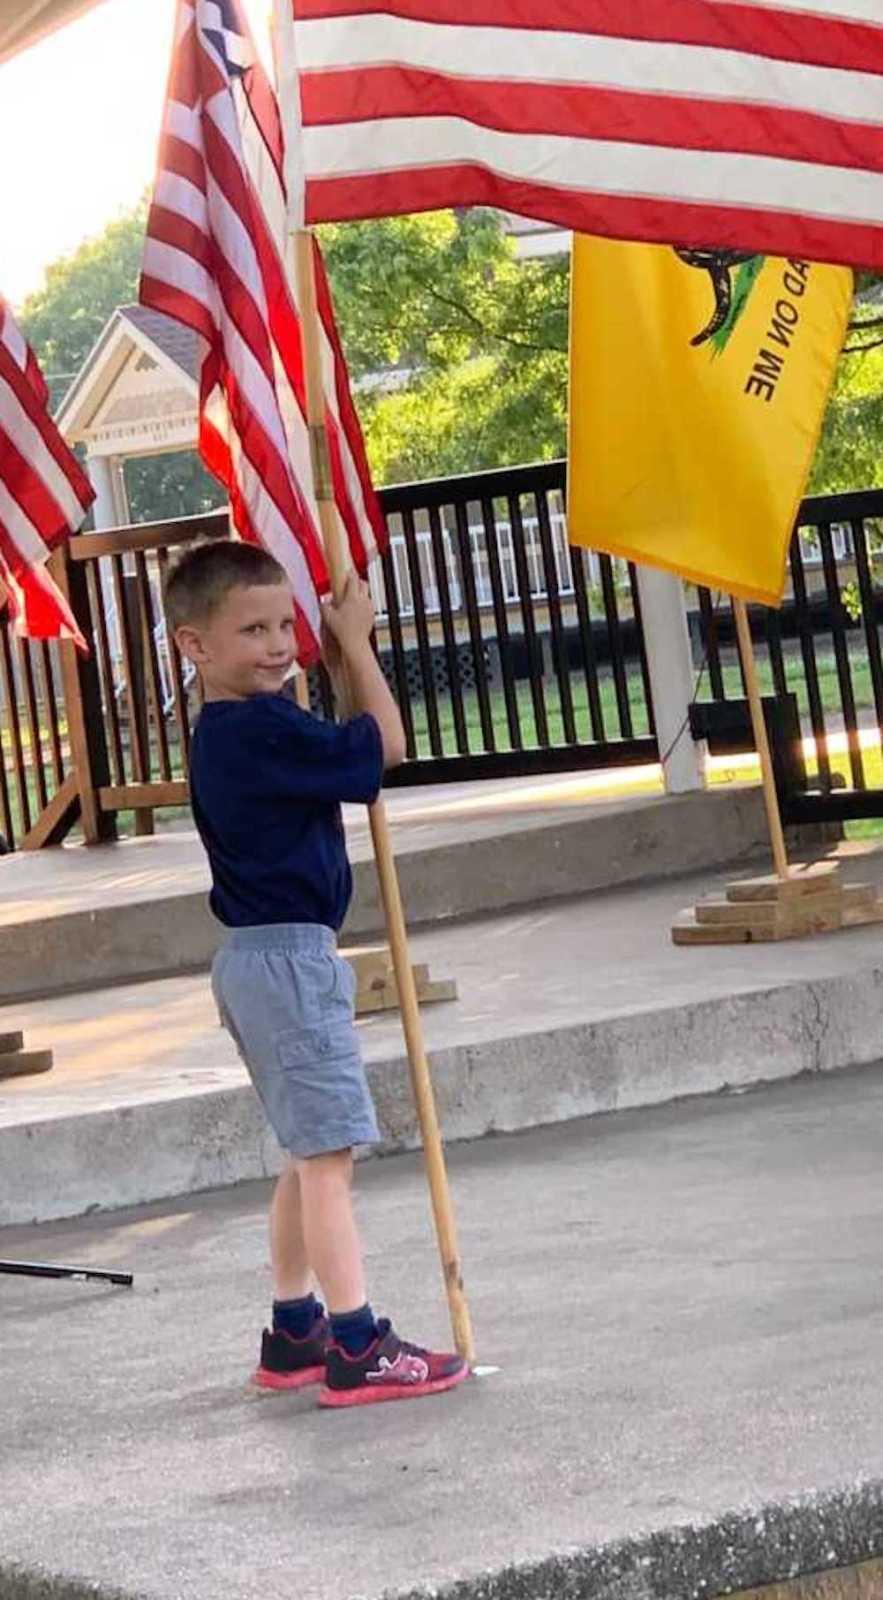 A little boy with a flag